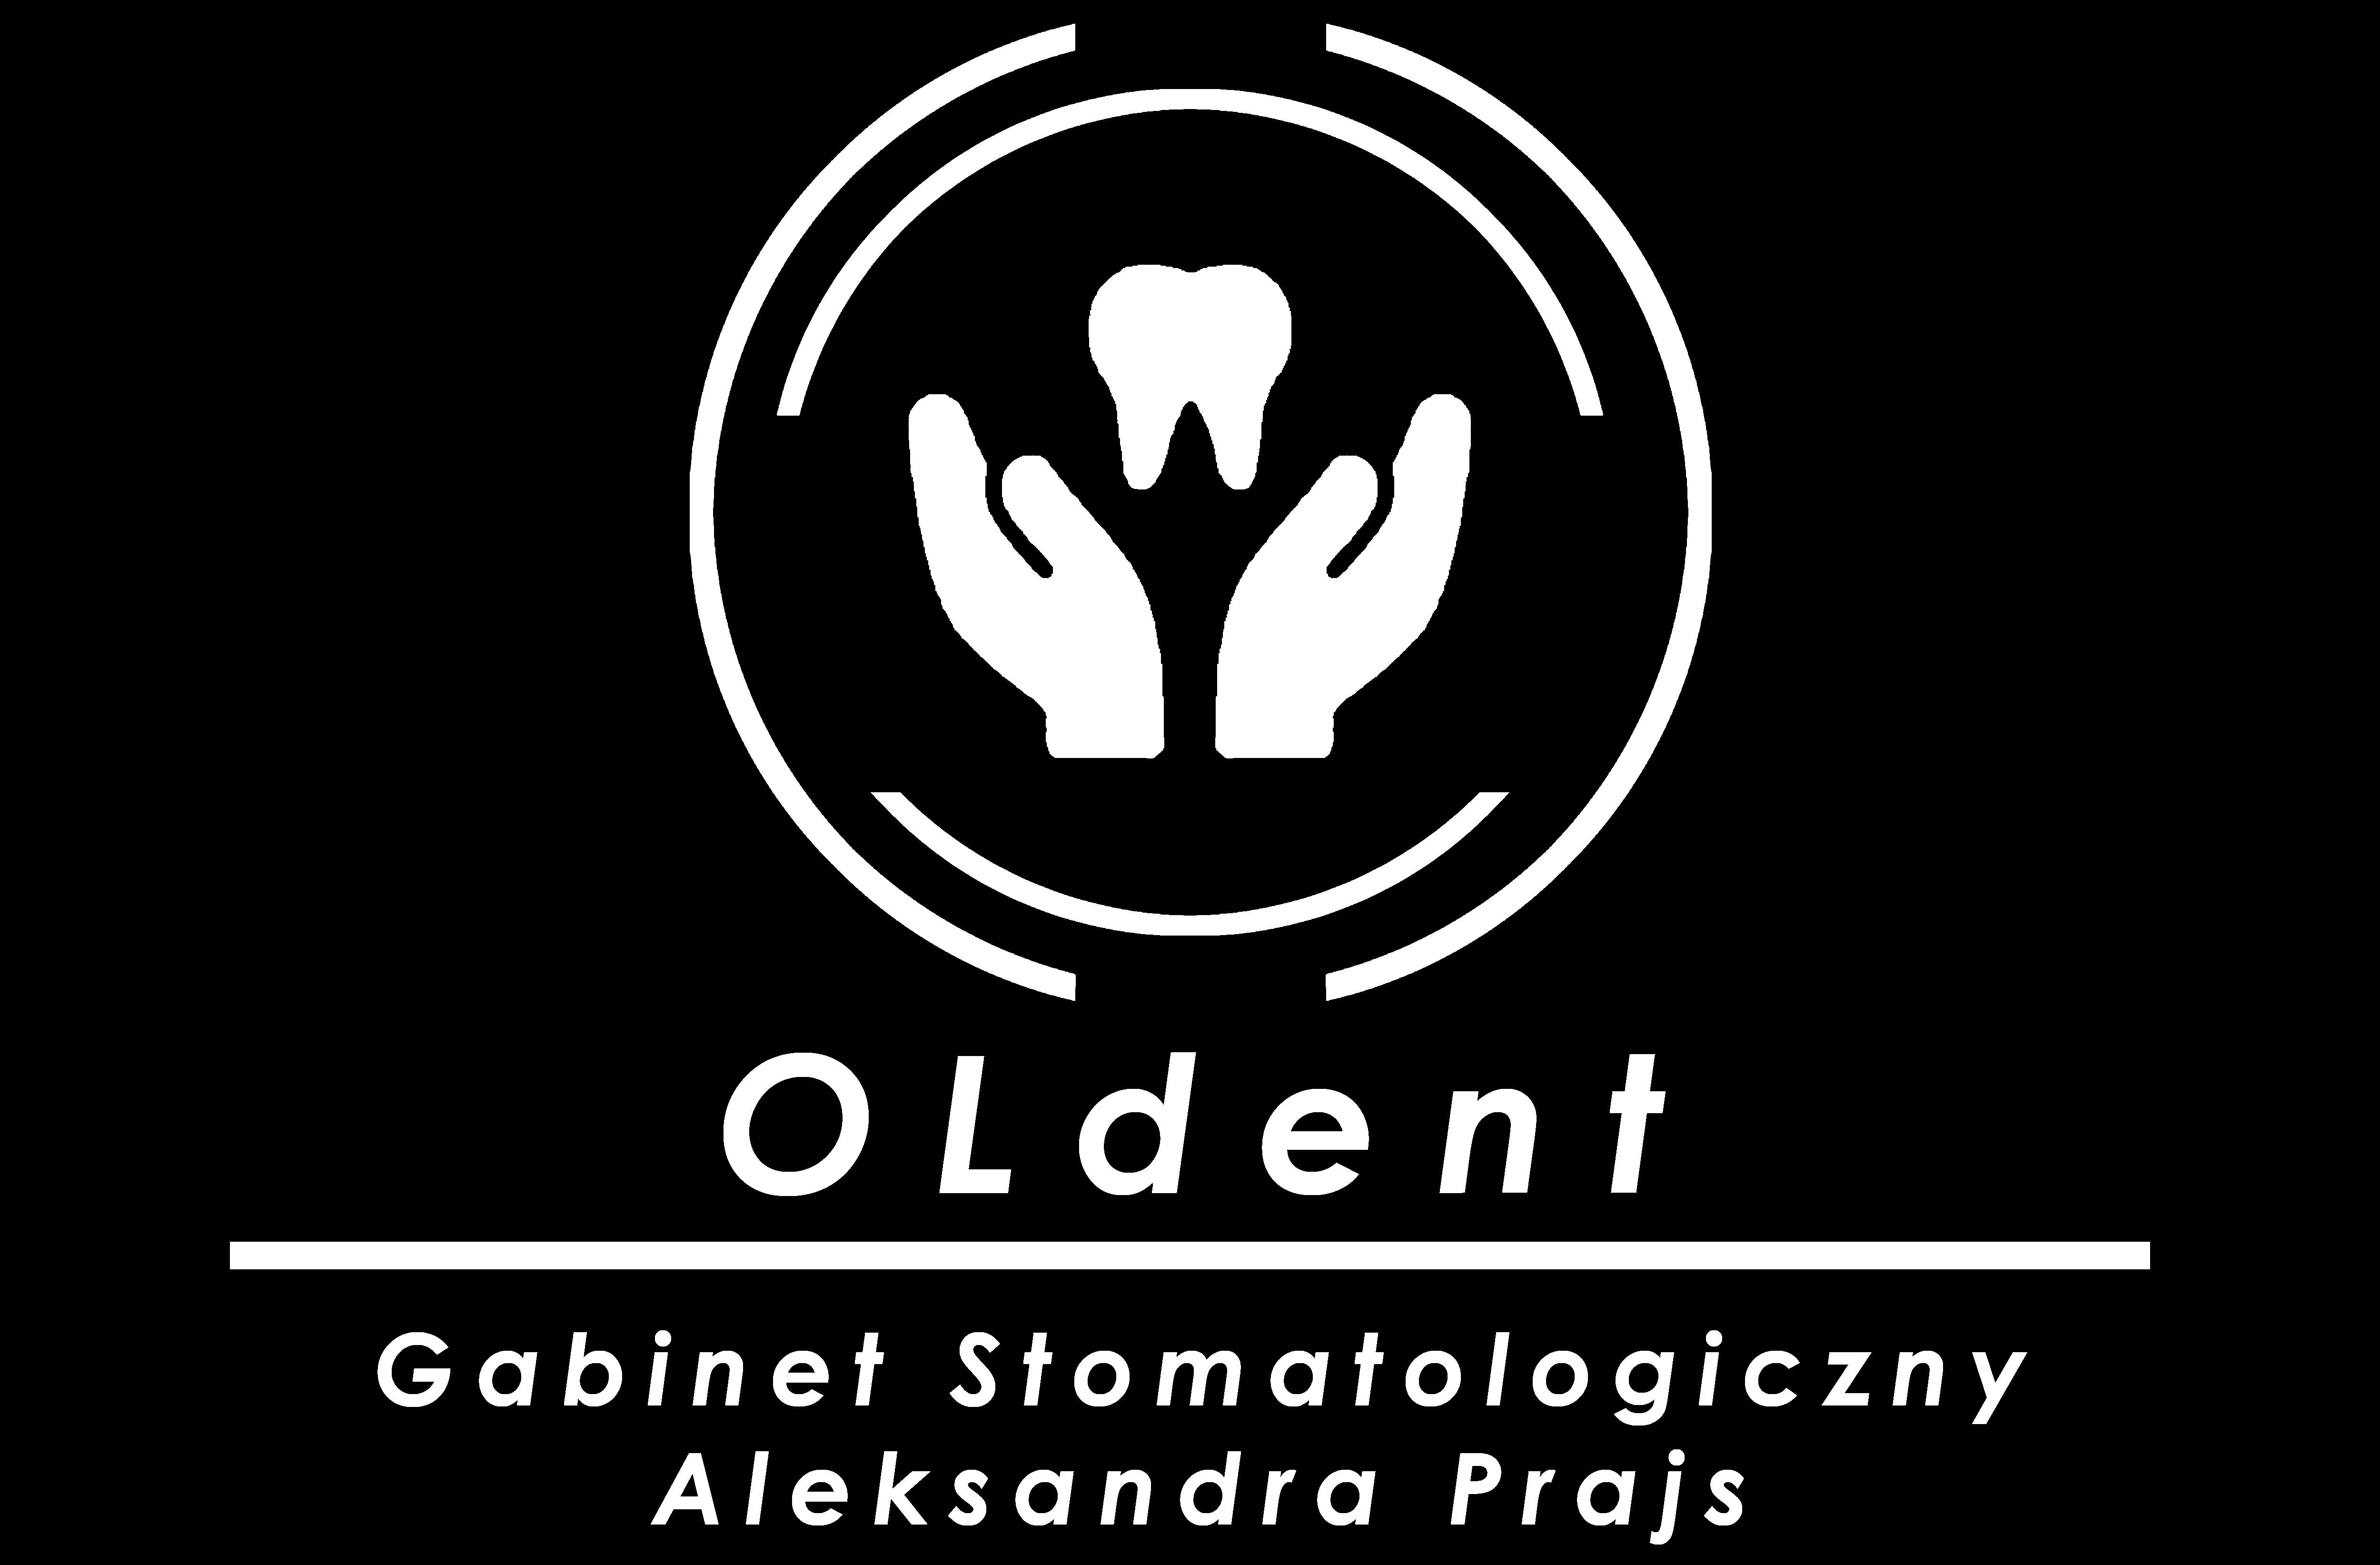 OLdent Gabinet Stomatologiczny Aleksandra Prajs